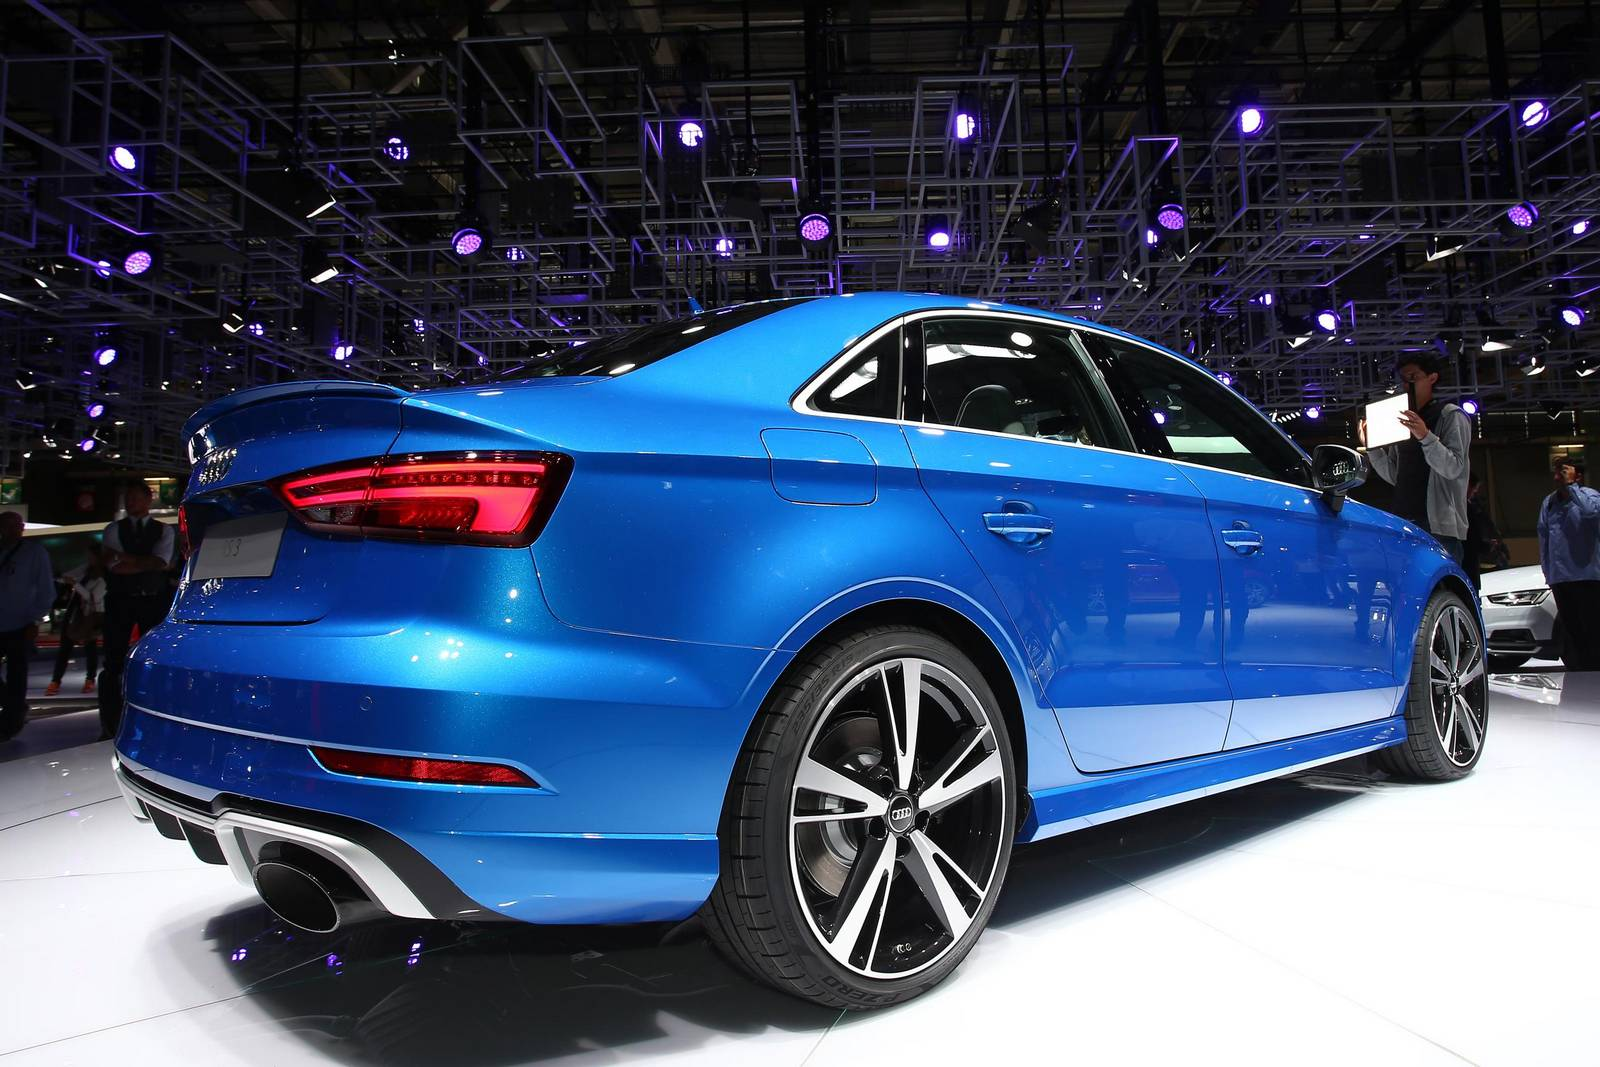 Paris 2016: Audi RS3 Sedan - GTspirit